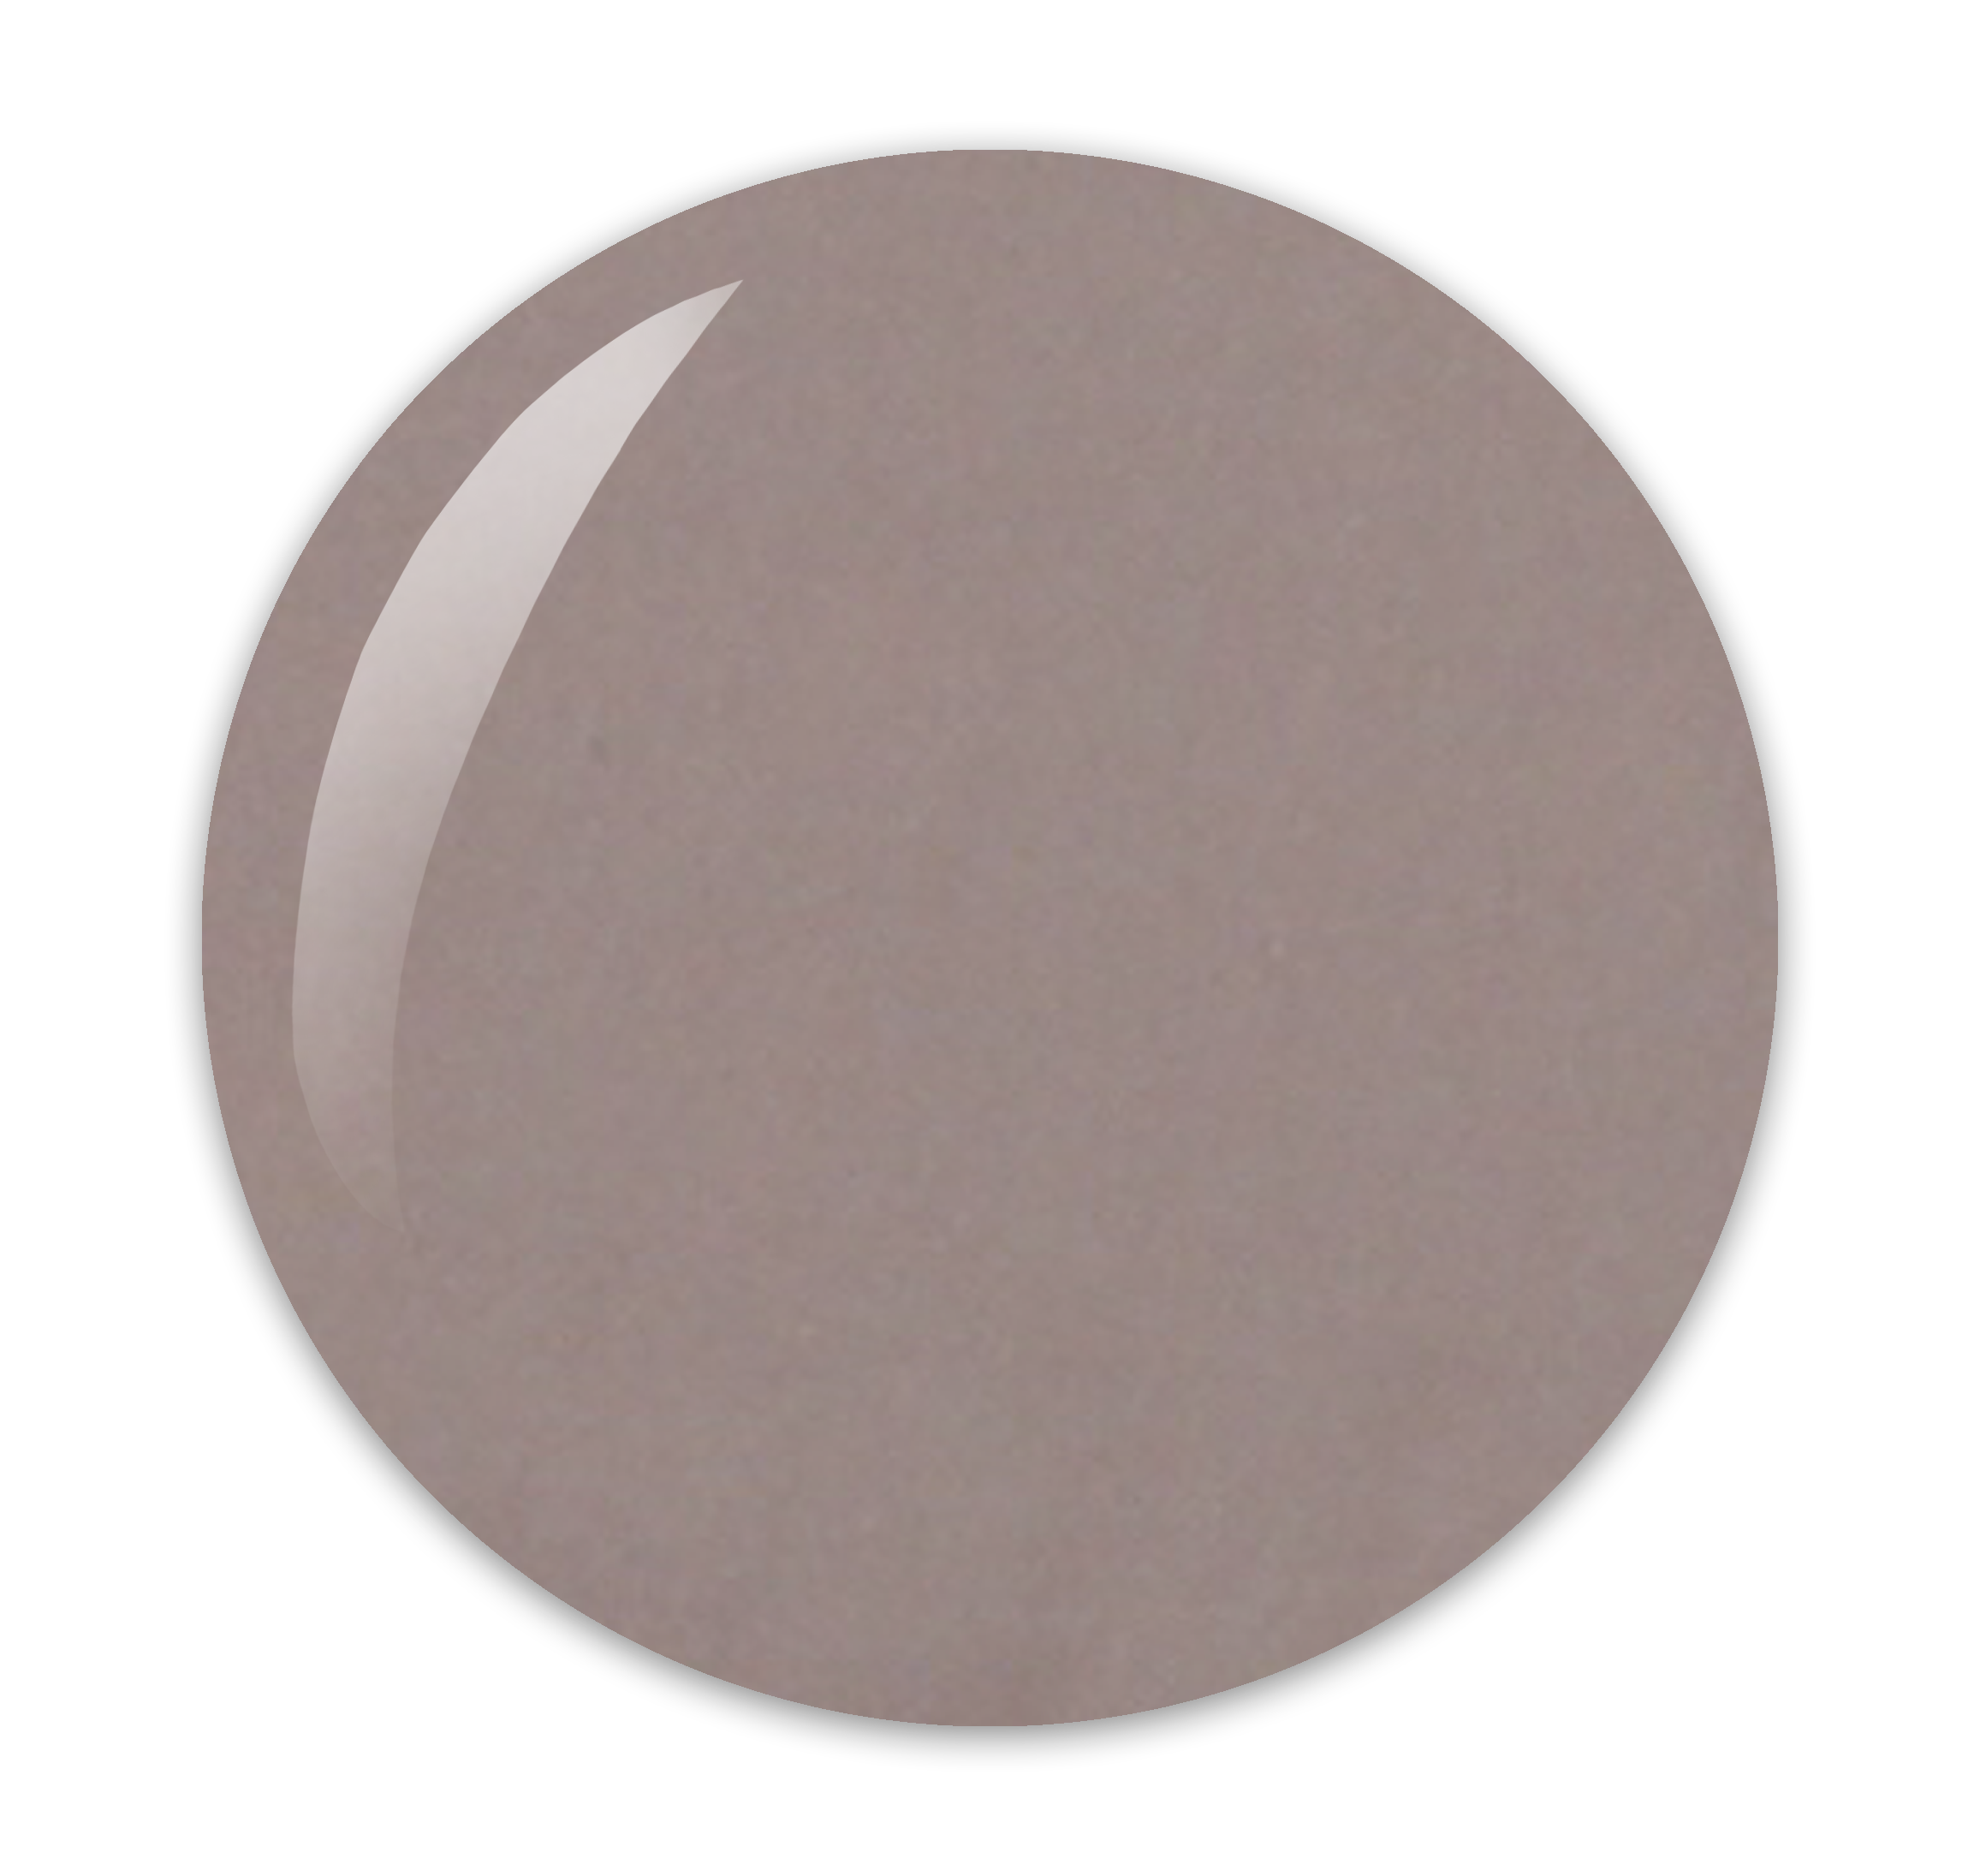 Herôme nagellak nude kleur nr 4 uit collectie